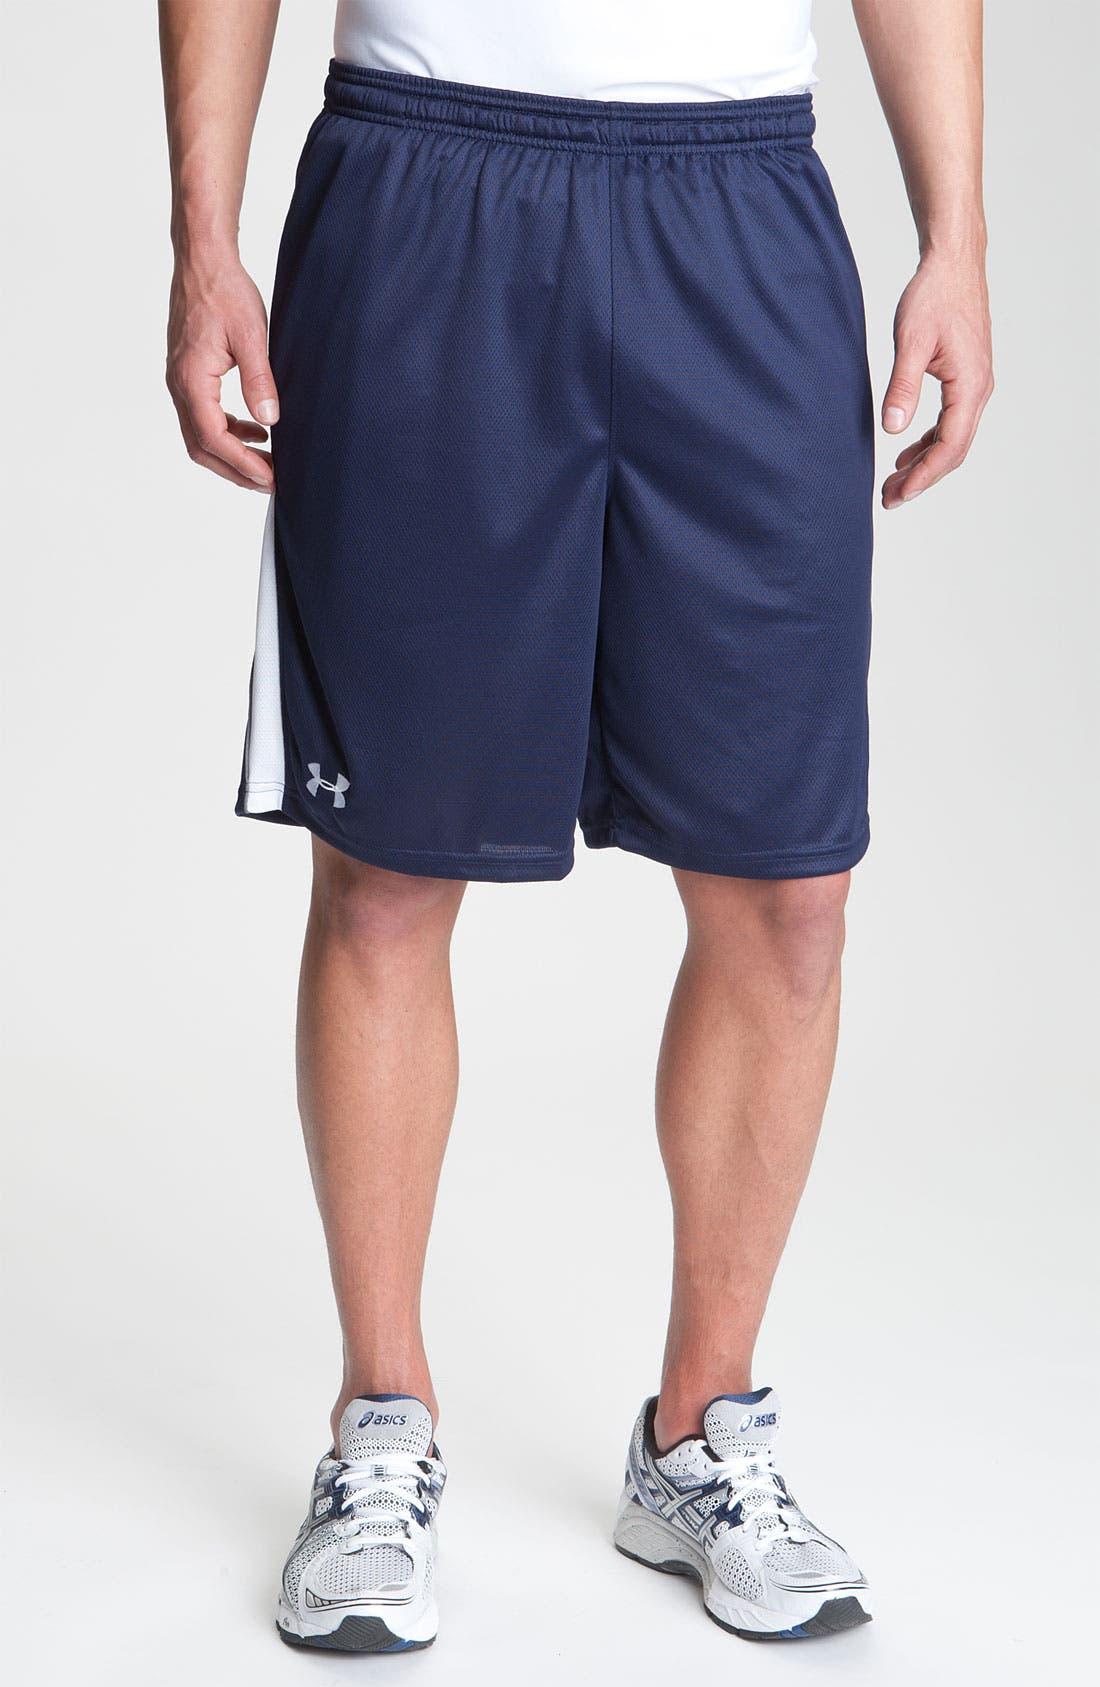 Alternate Image 1 Selected - Under Armour 'Flex Stripe' Shorts